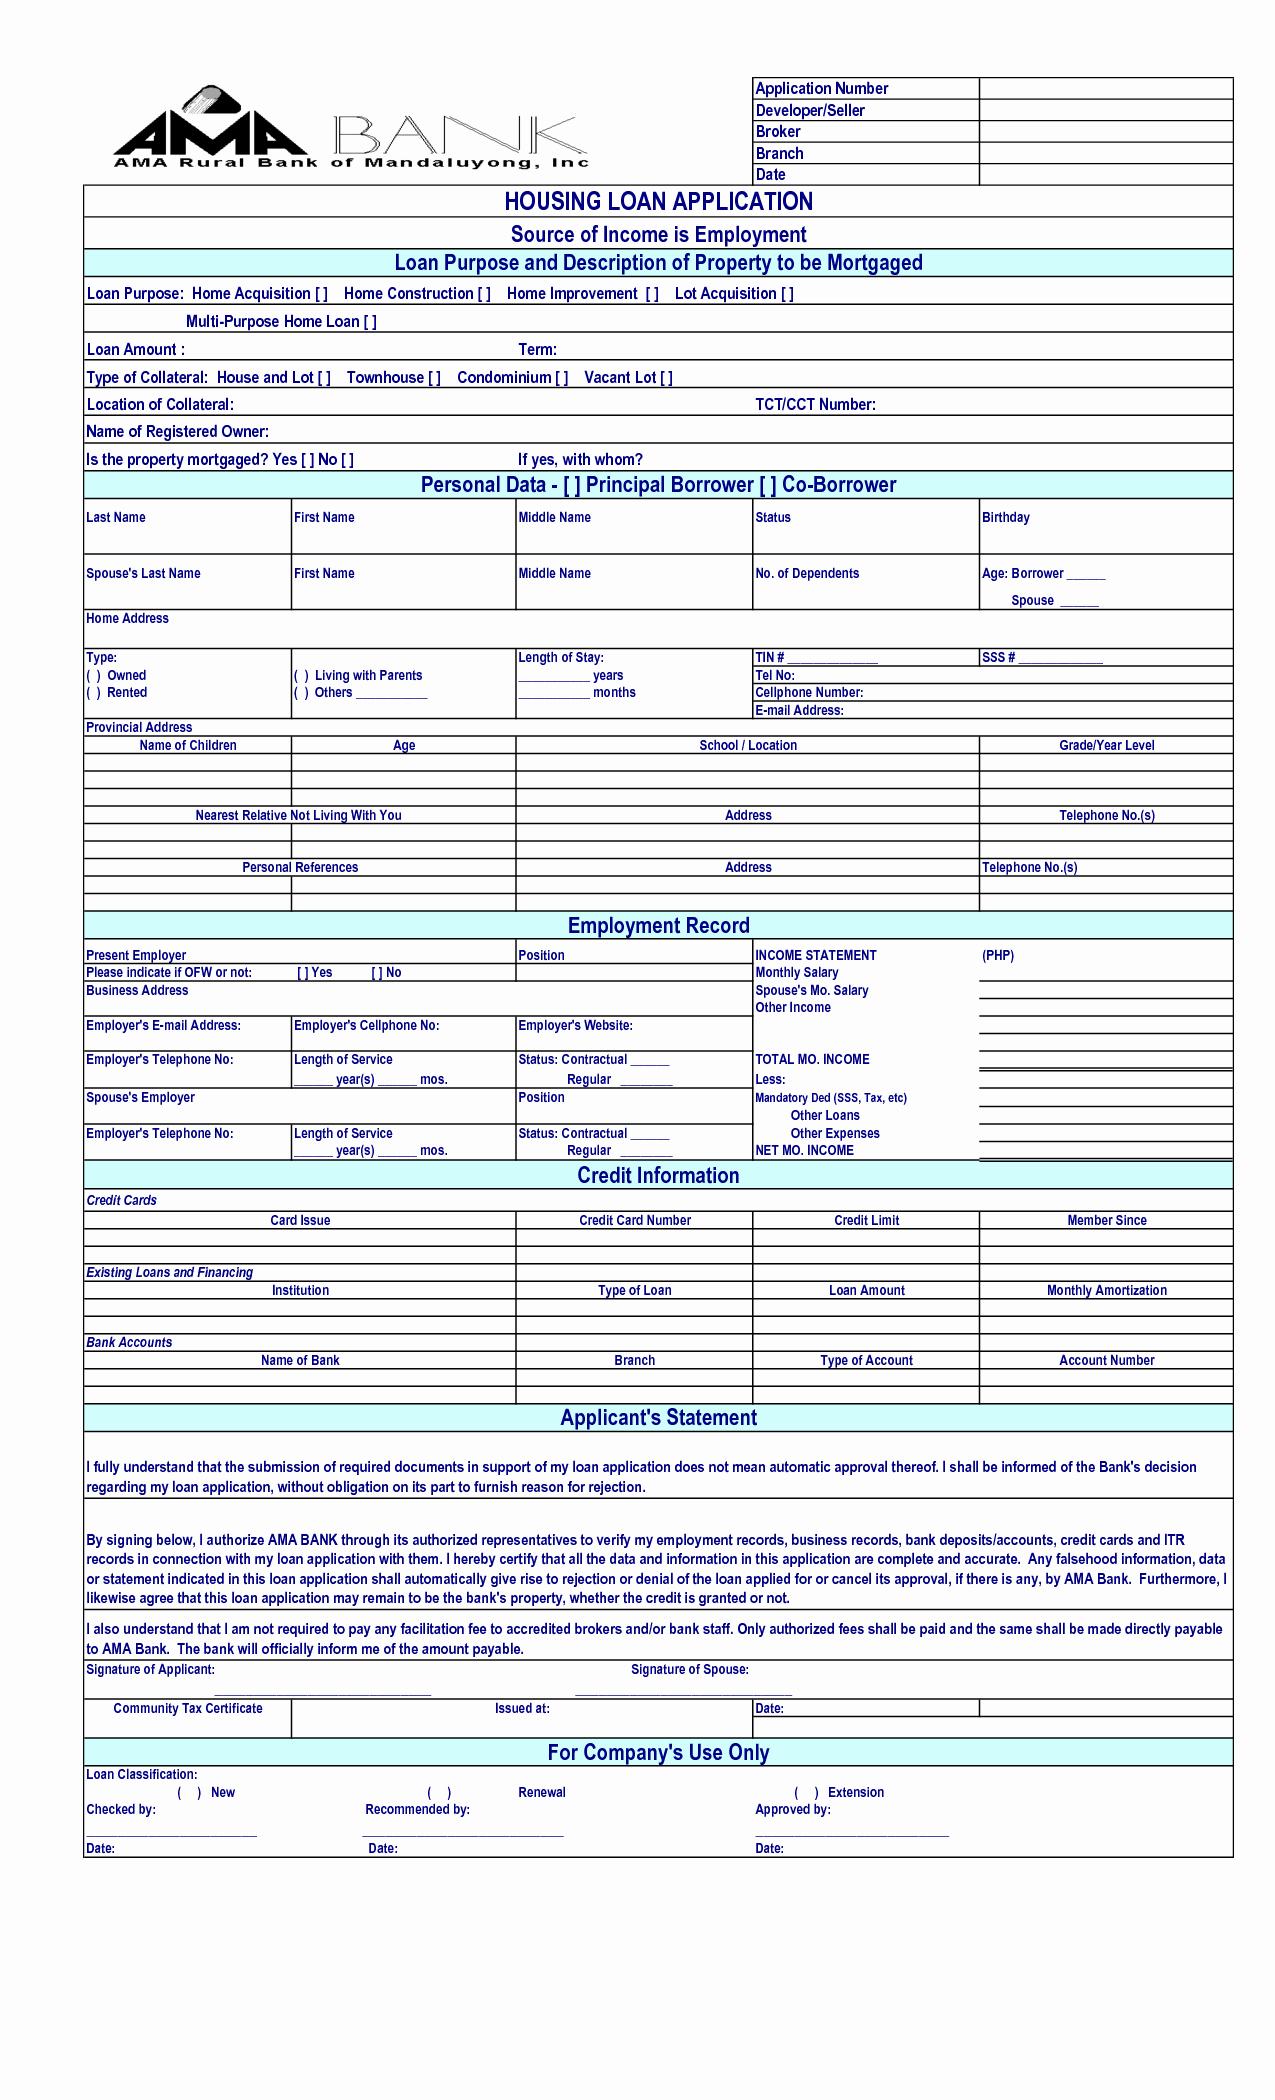 Loan Application Templates Beautiful Loan Application Template Free Printable Documents